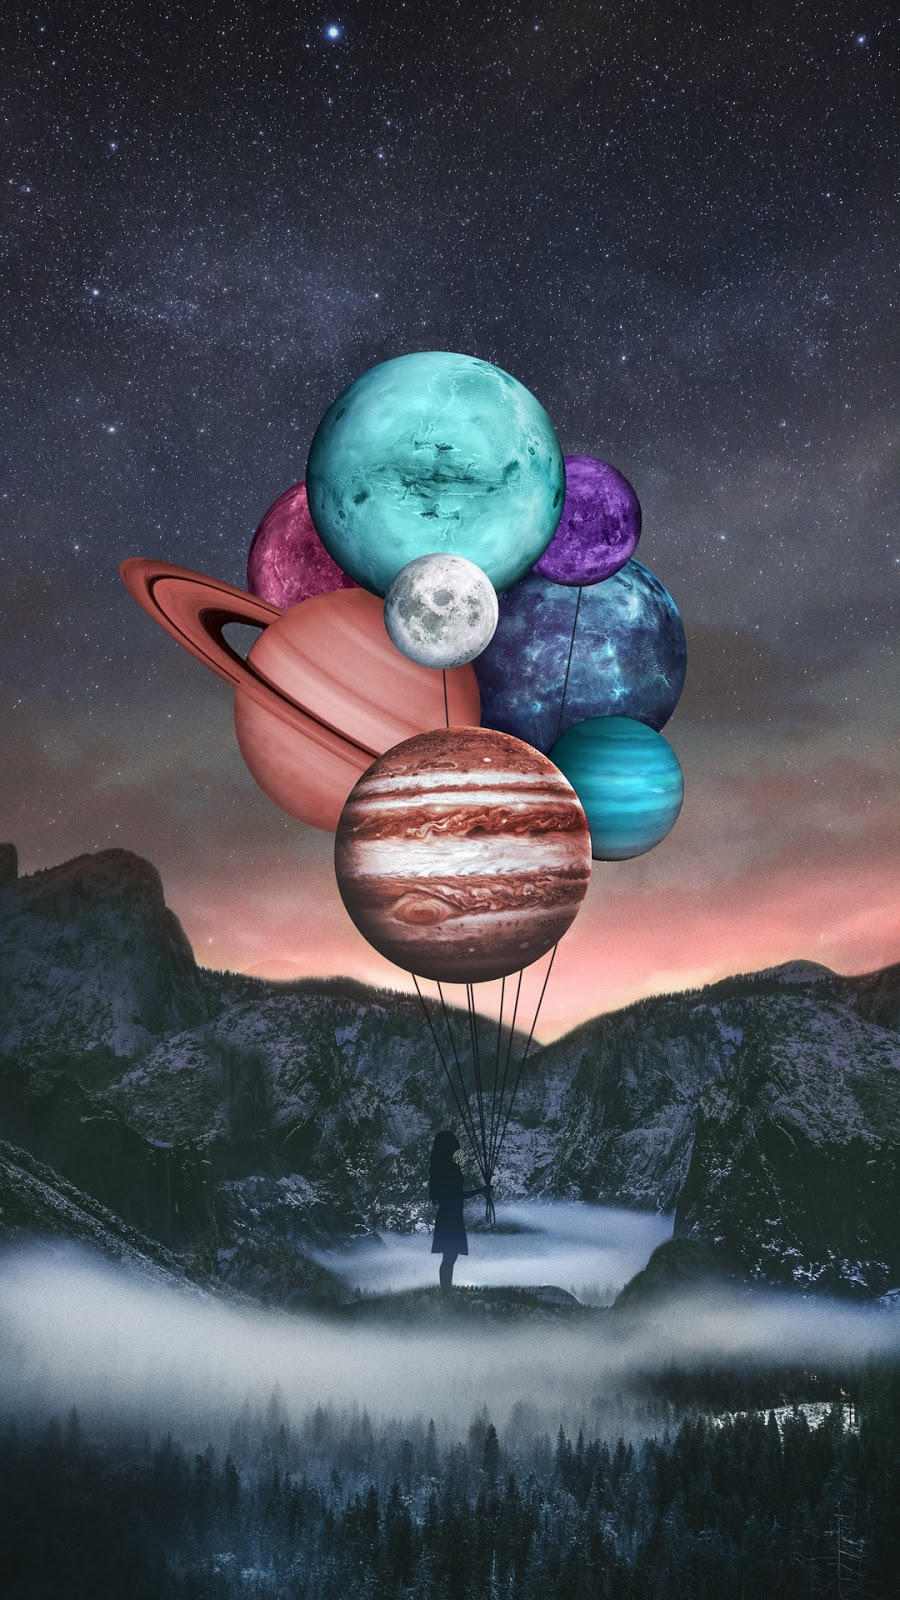 Contain the universe